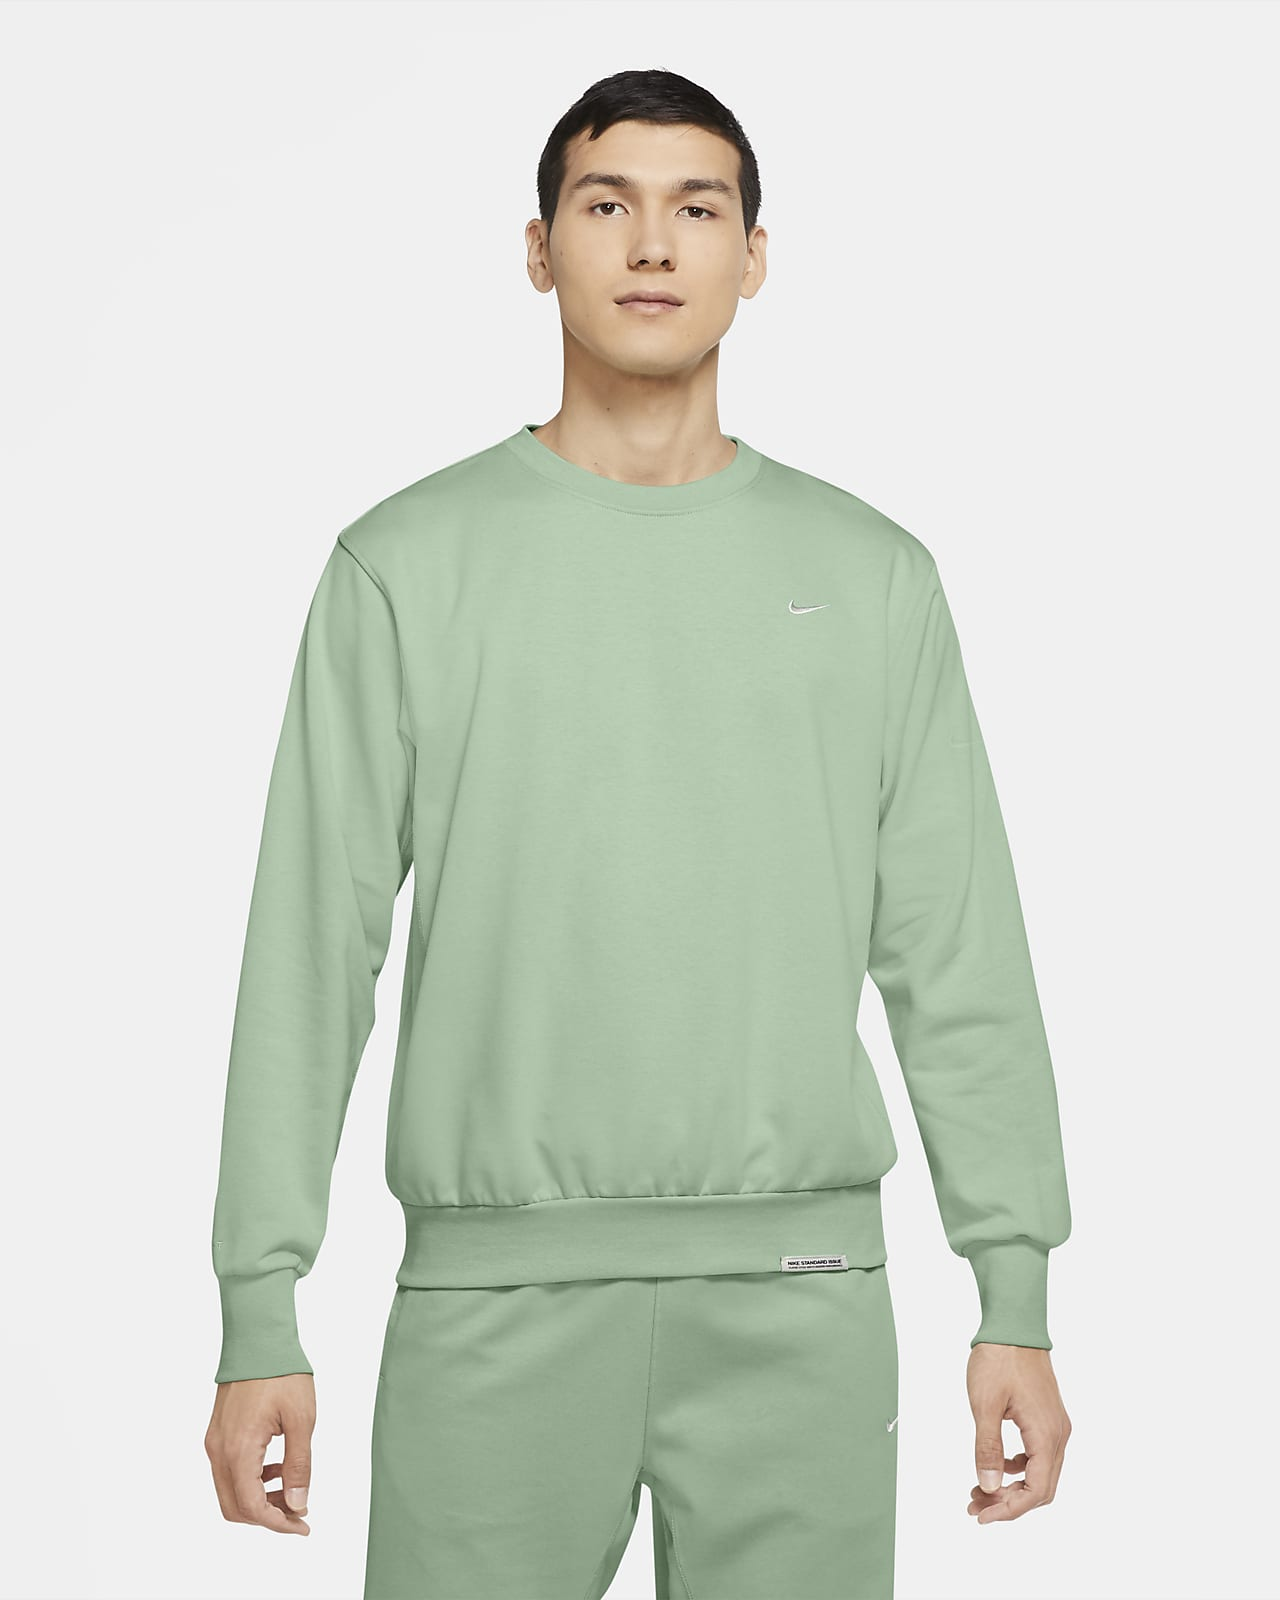 Nike Standard Issue 男子篮球圆领上衣